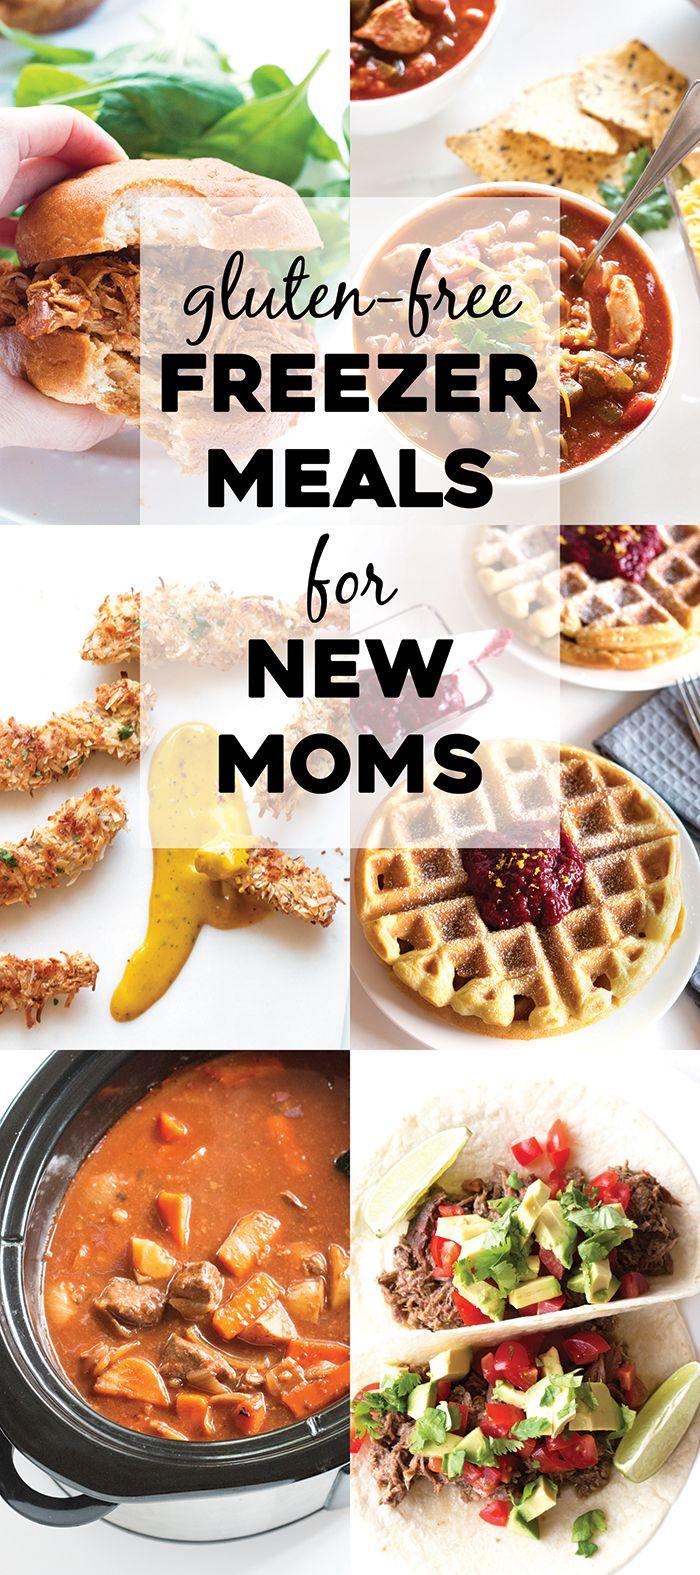 Gluten Free Freezer Meals For New Moms Gluten Free Freezer Meals